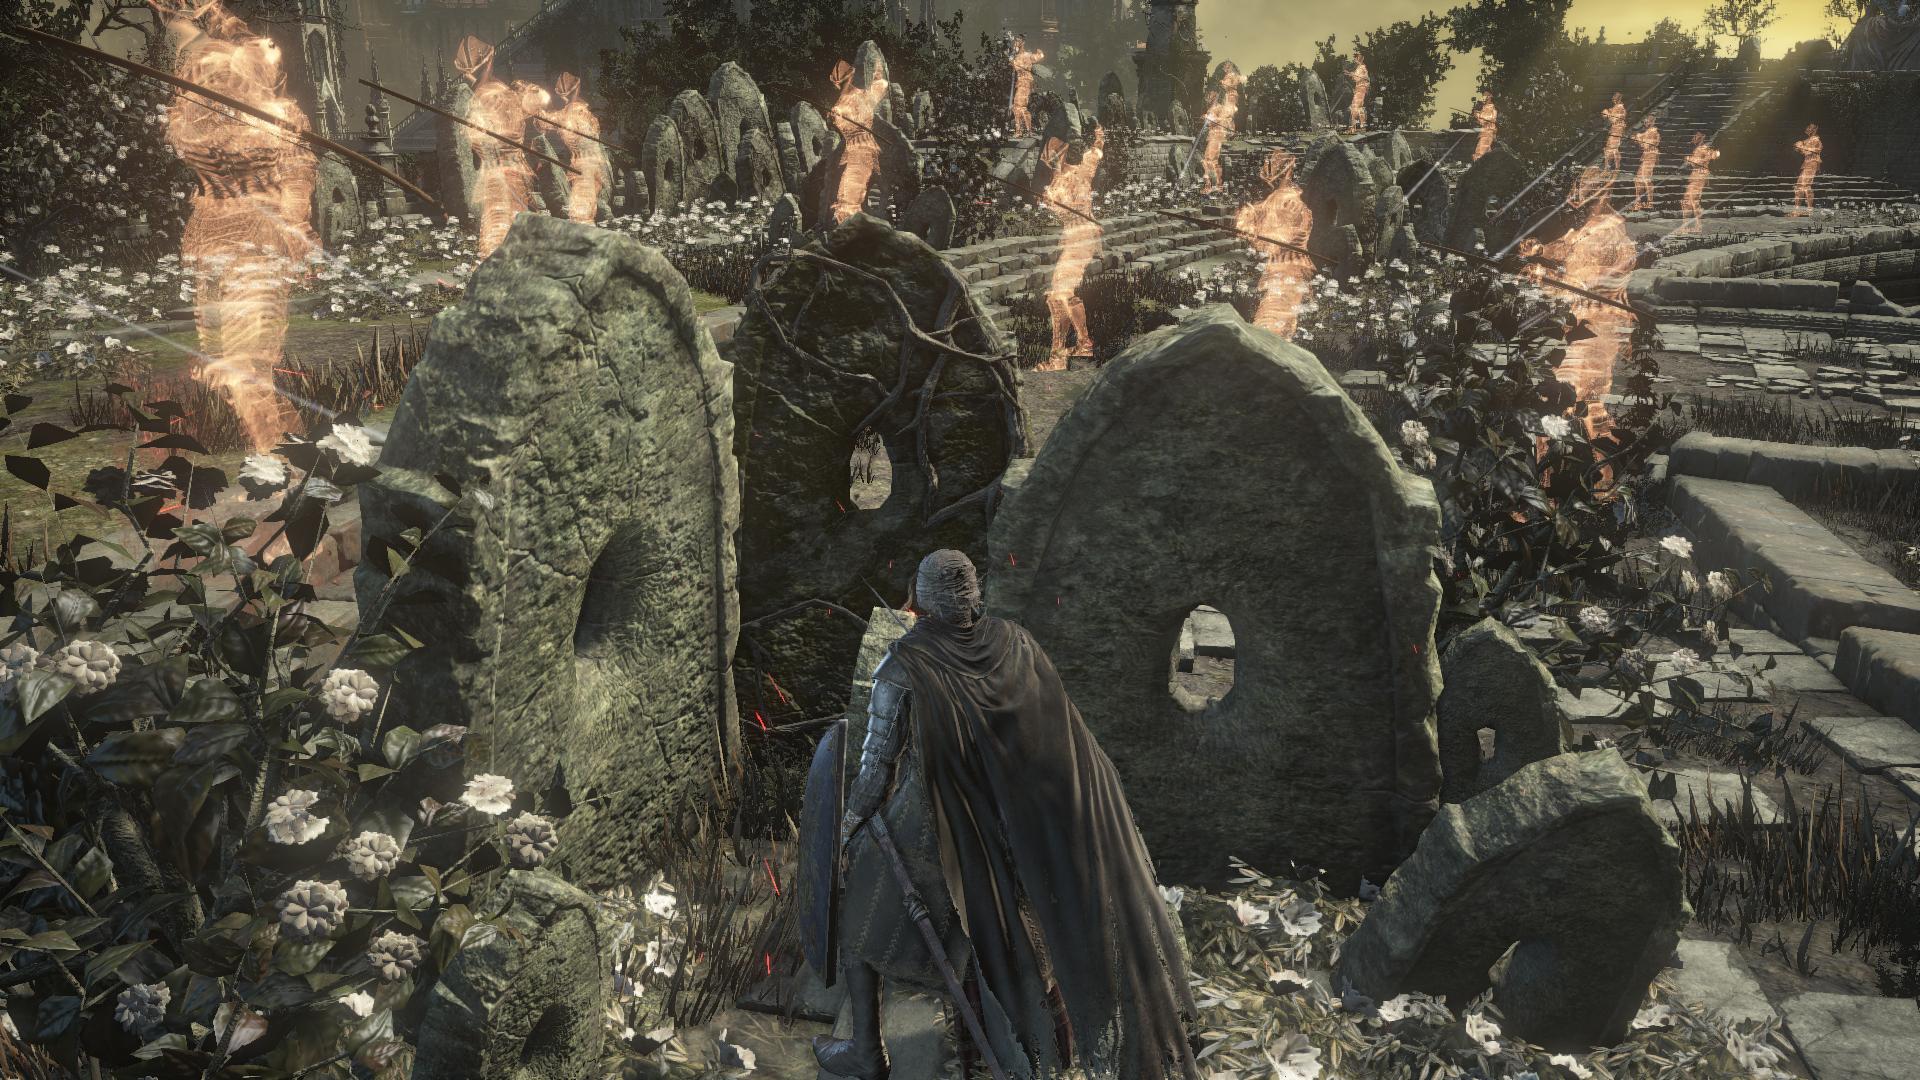 Xbox One Dark Souls III: The Ringed City